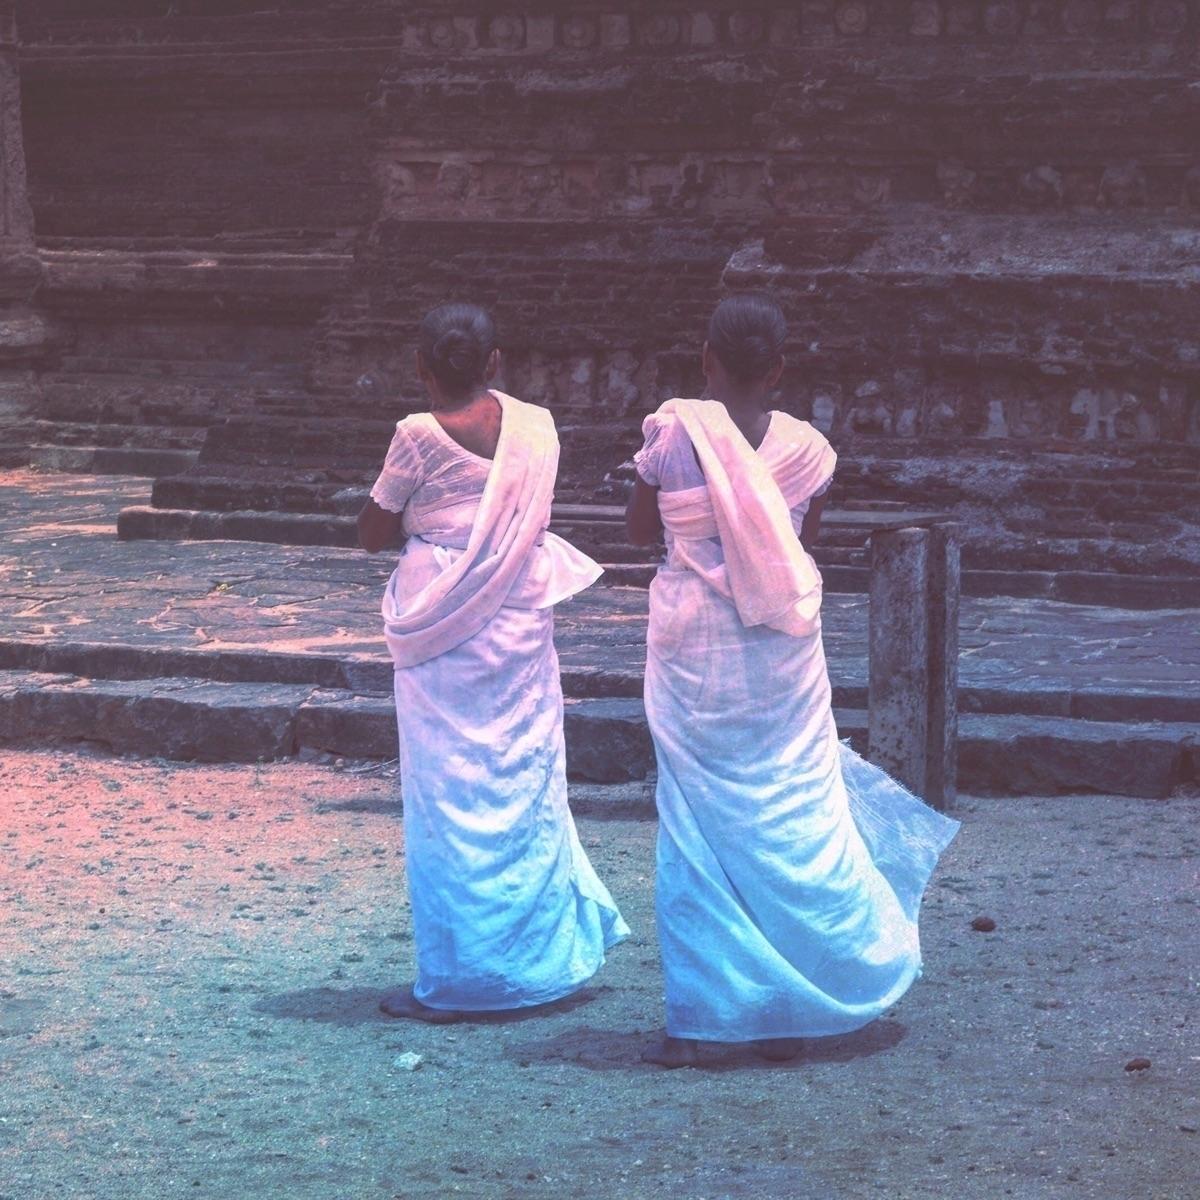 Sisters Sri Lanka 2015 - dainahodgson | ello